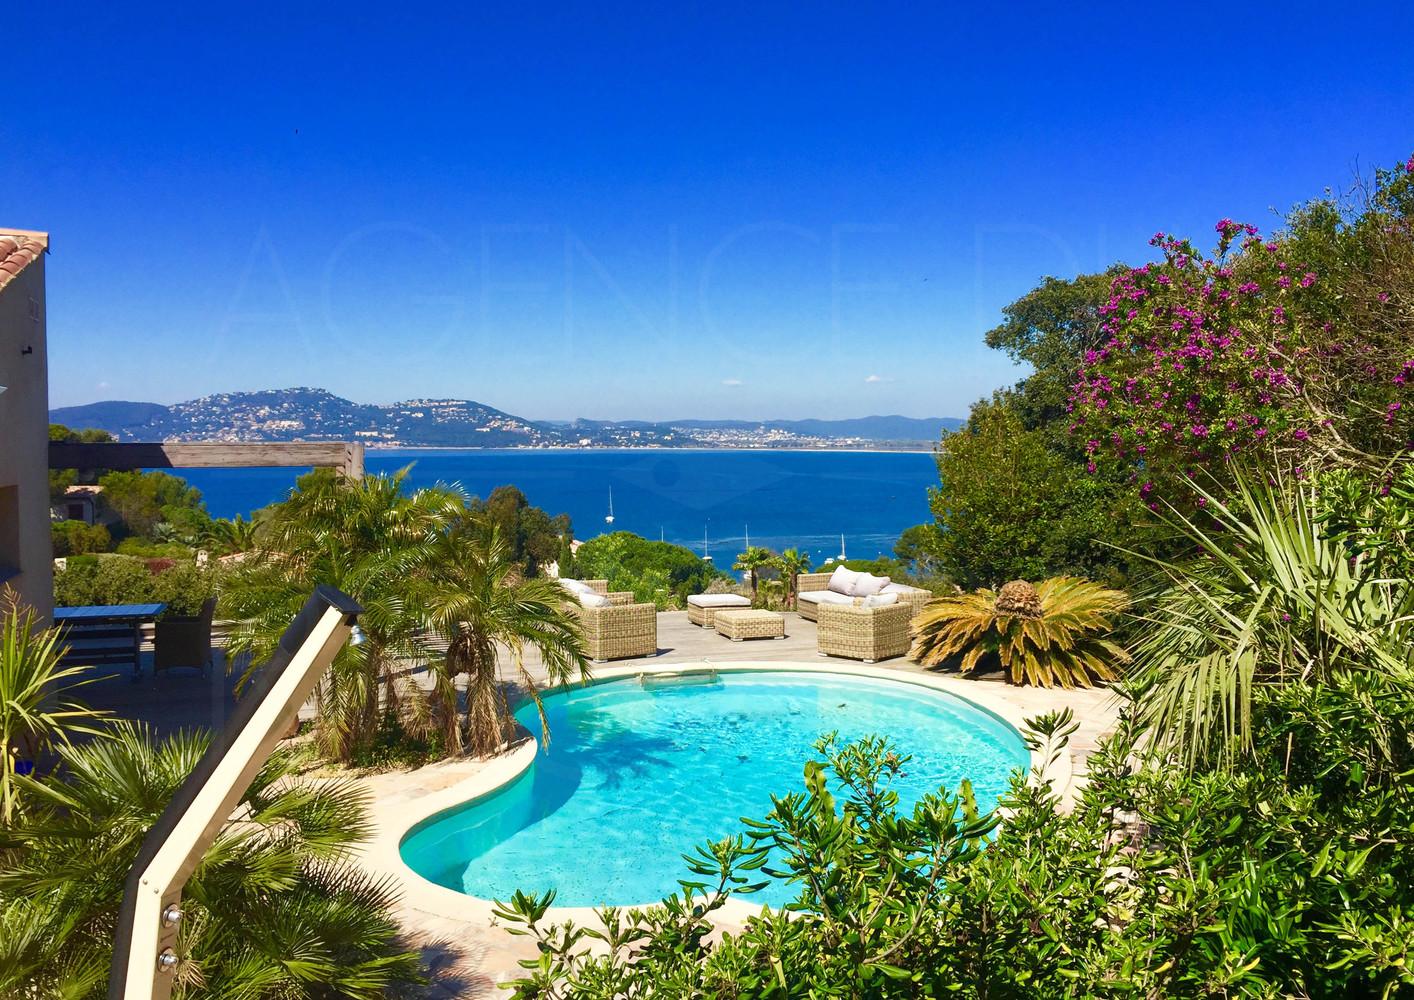 Giens villa vue mer panoramique villa plage pieds giens 5 chambres piscine - Piscine debordement mer toulon ...